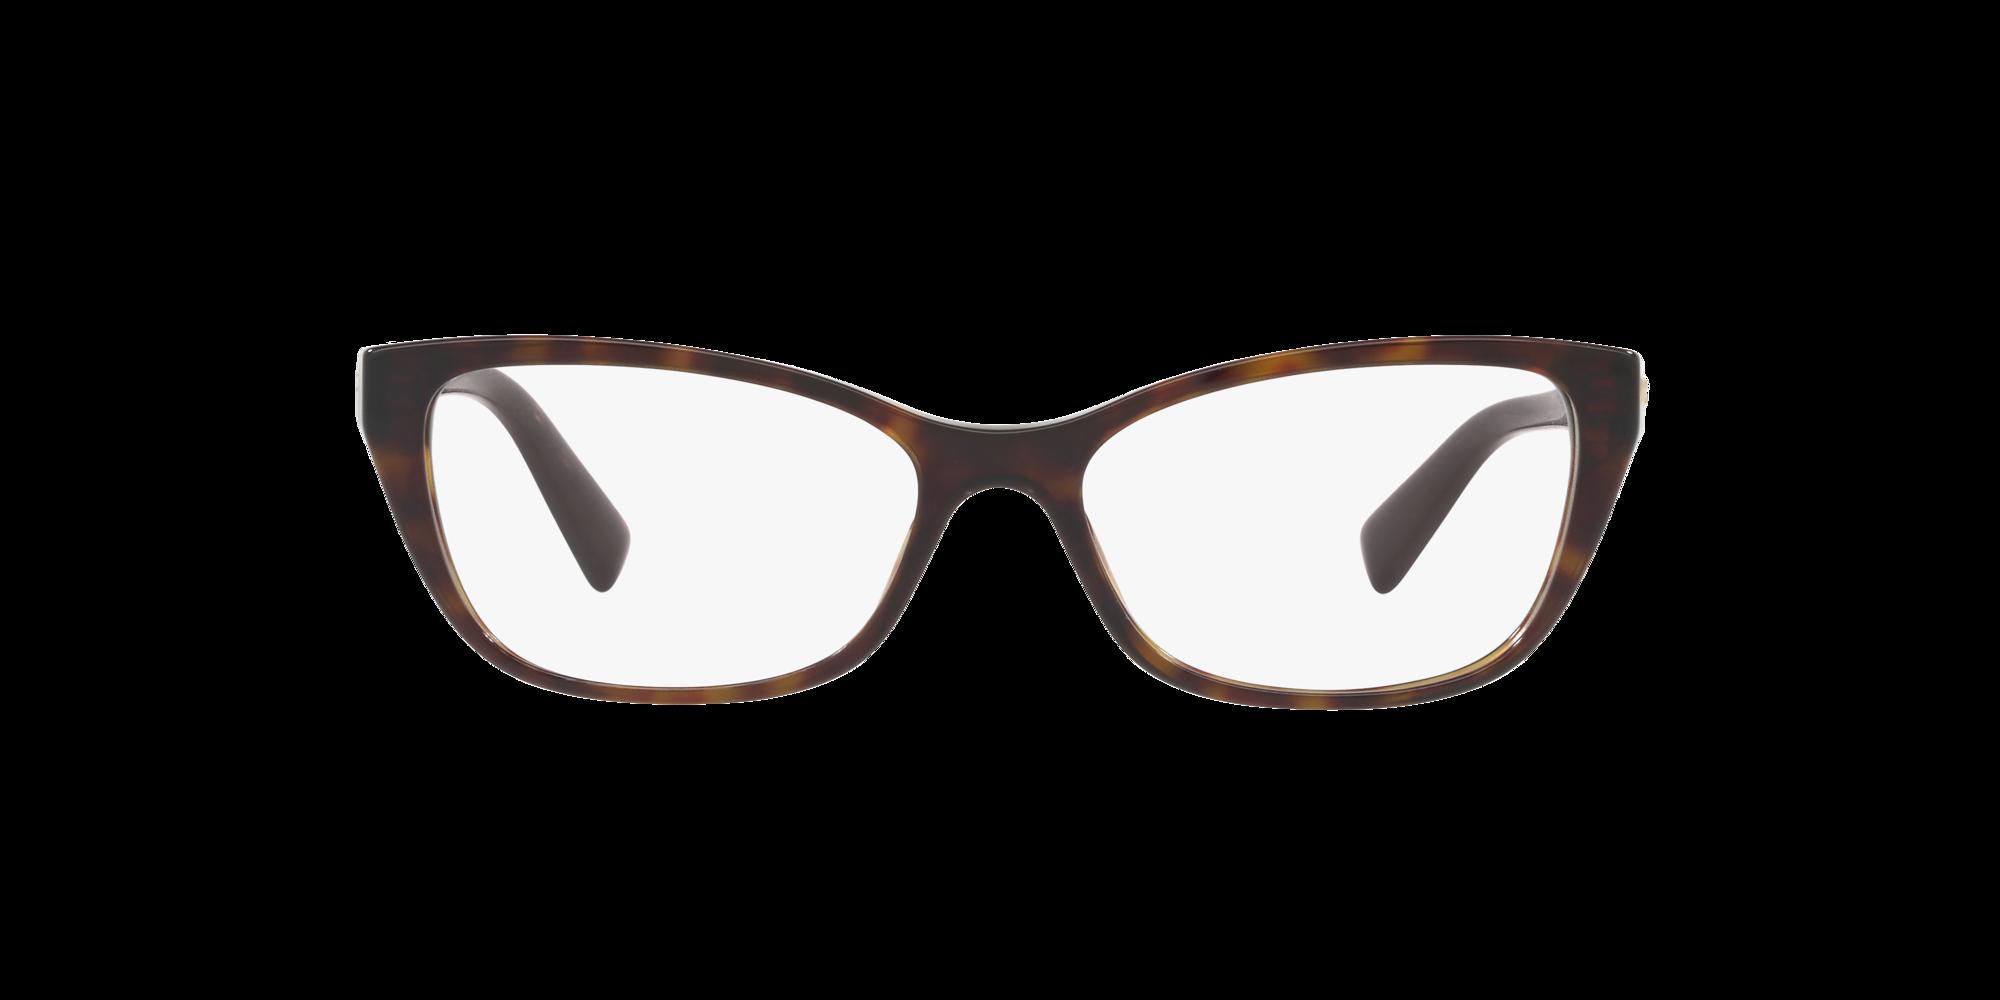 Image for VE3249 from LensCrafters | Glasses, Prescription Glasses Online, Eyewear